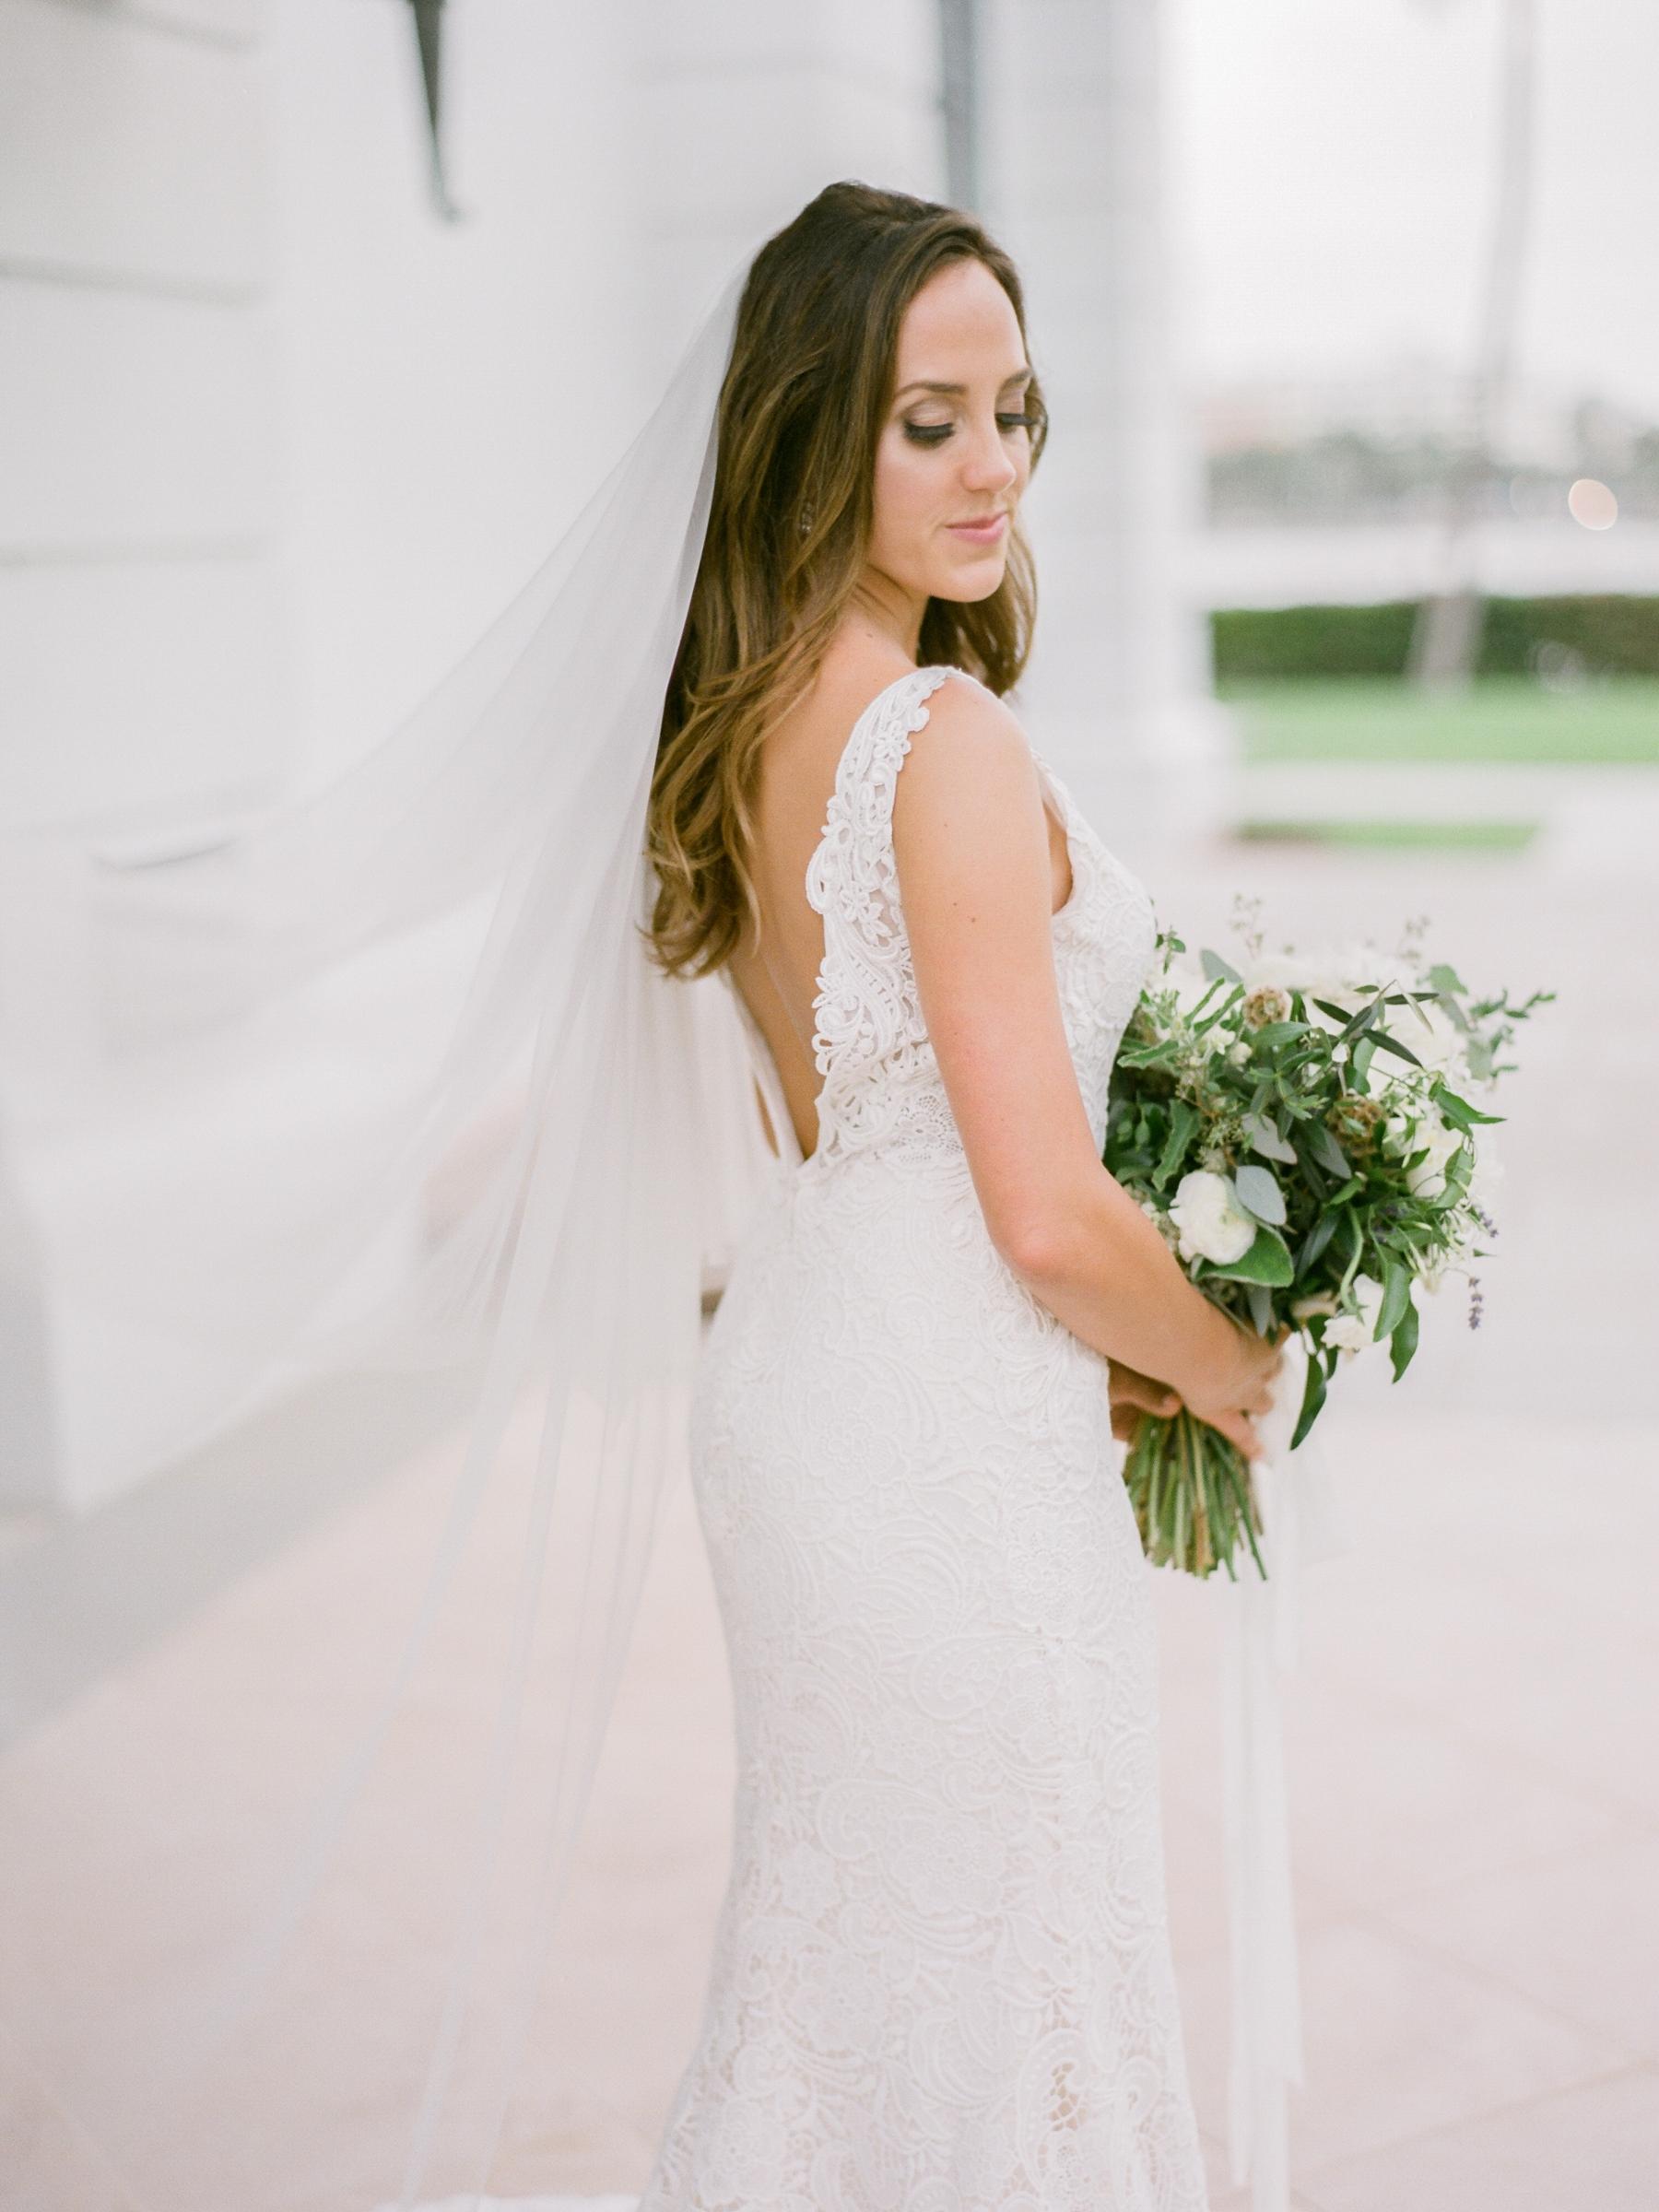 Bridal portraits on film